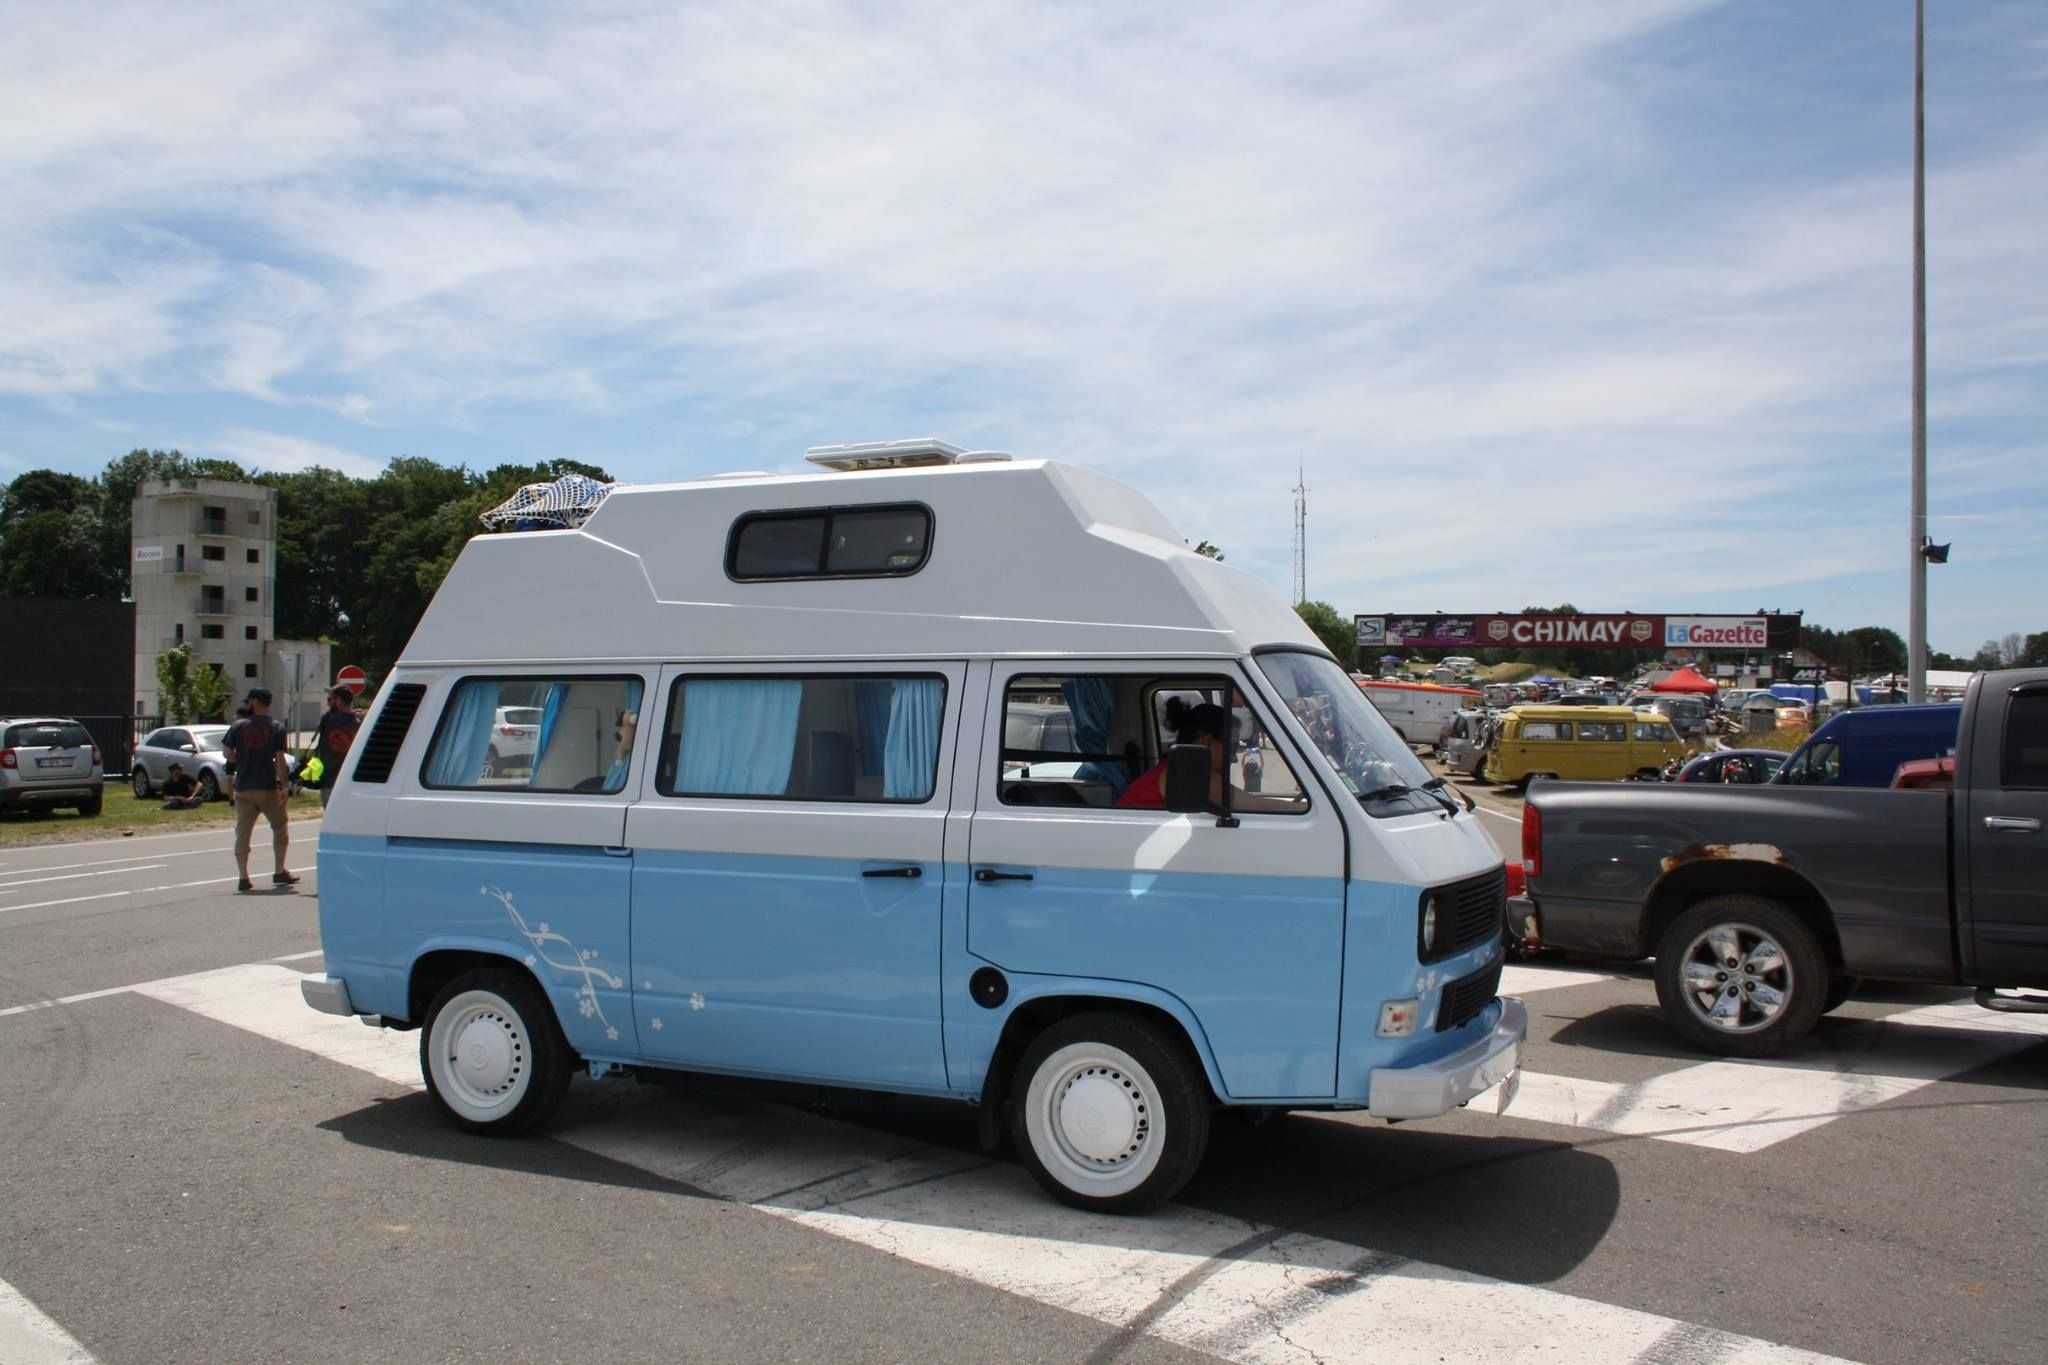 dj pin camper bus kombi volkswagen pesquisa google vw booth busvw pinterest